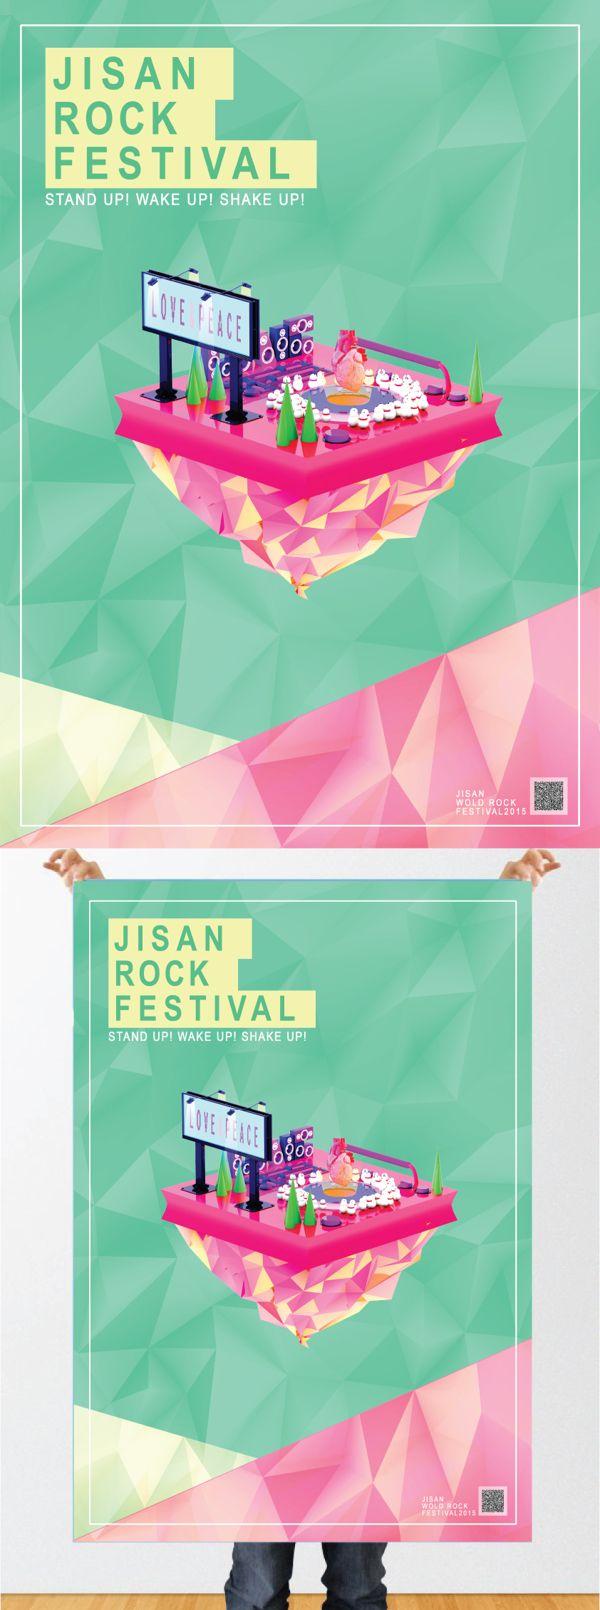 jisanrockfestival by jung jiyung, via Behance